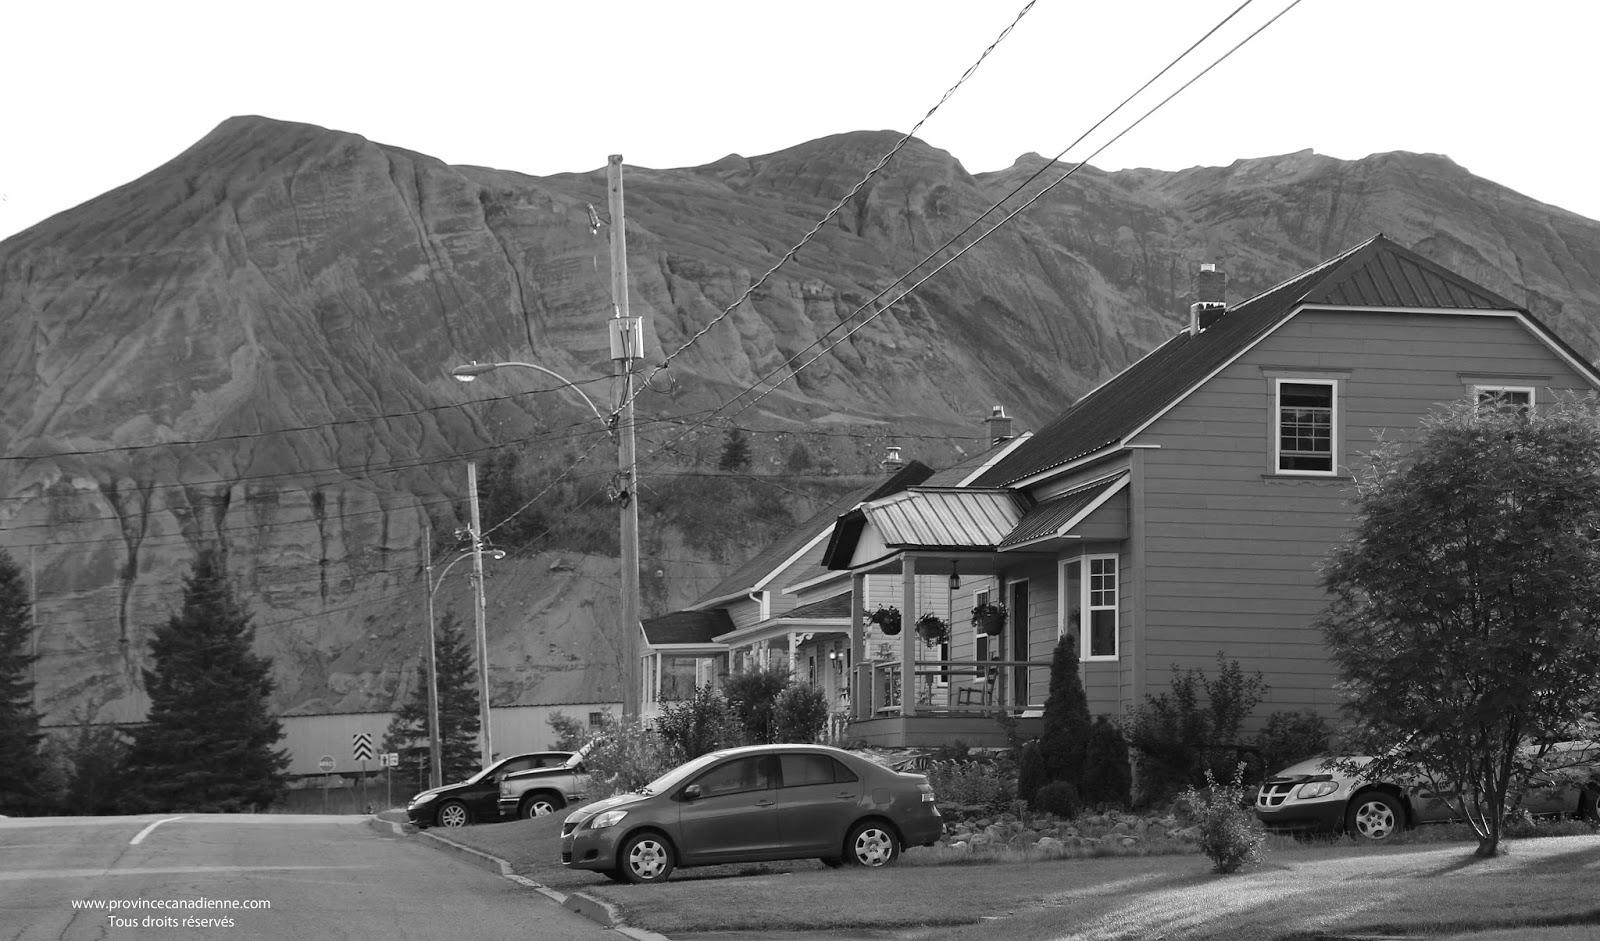 Province canadienne les anciennes mines for Amiante maison ancienne